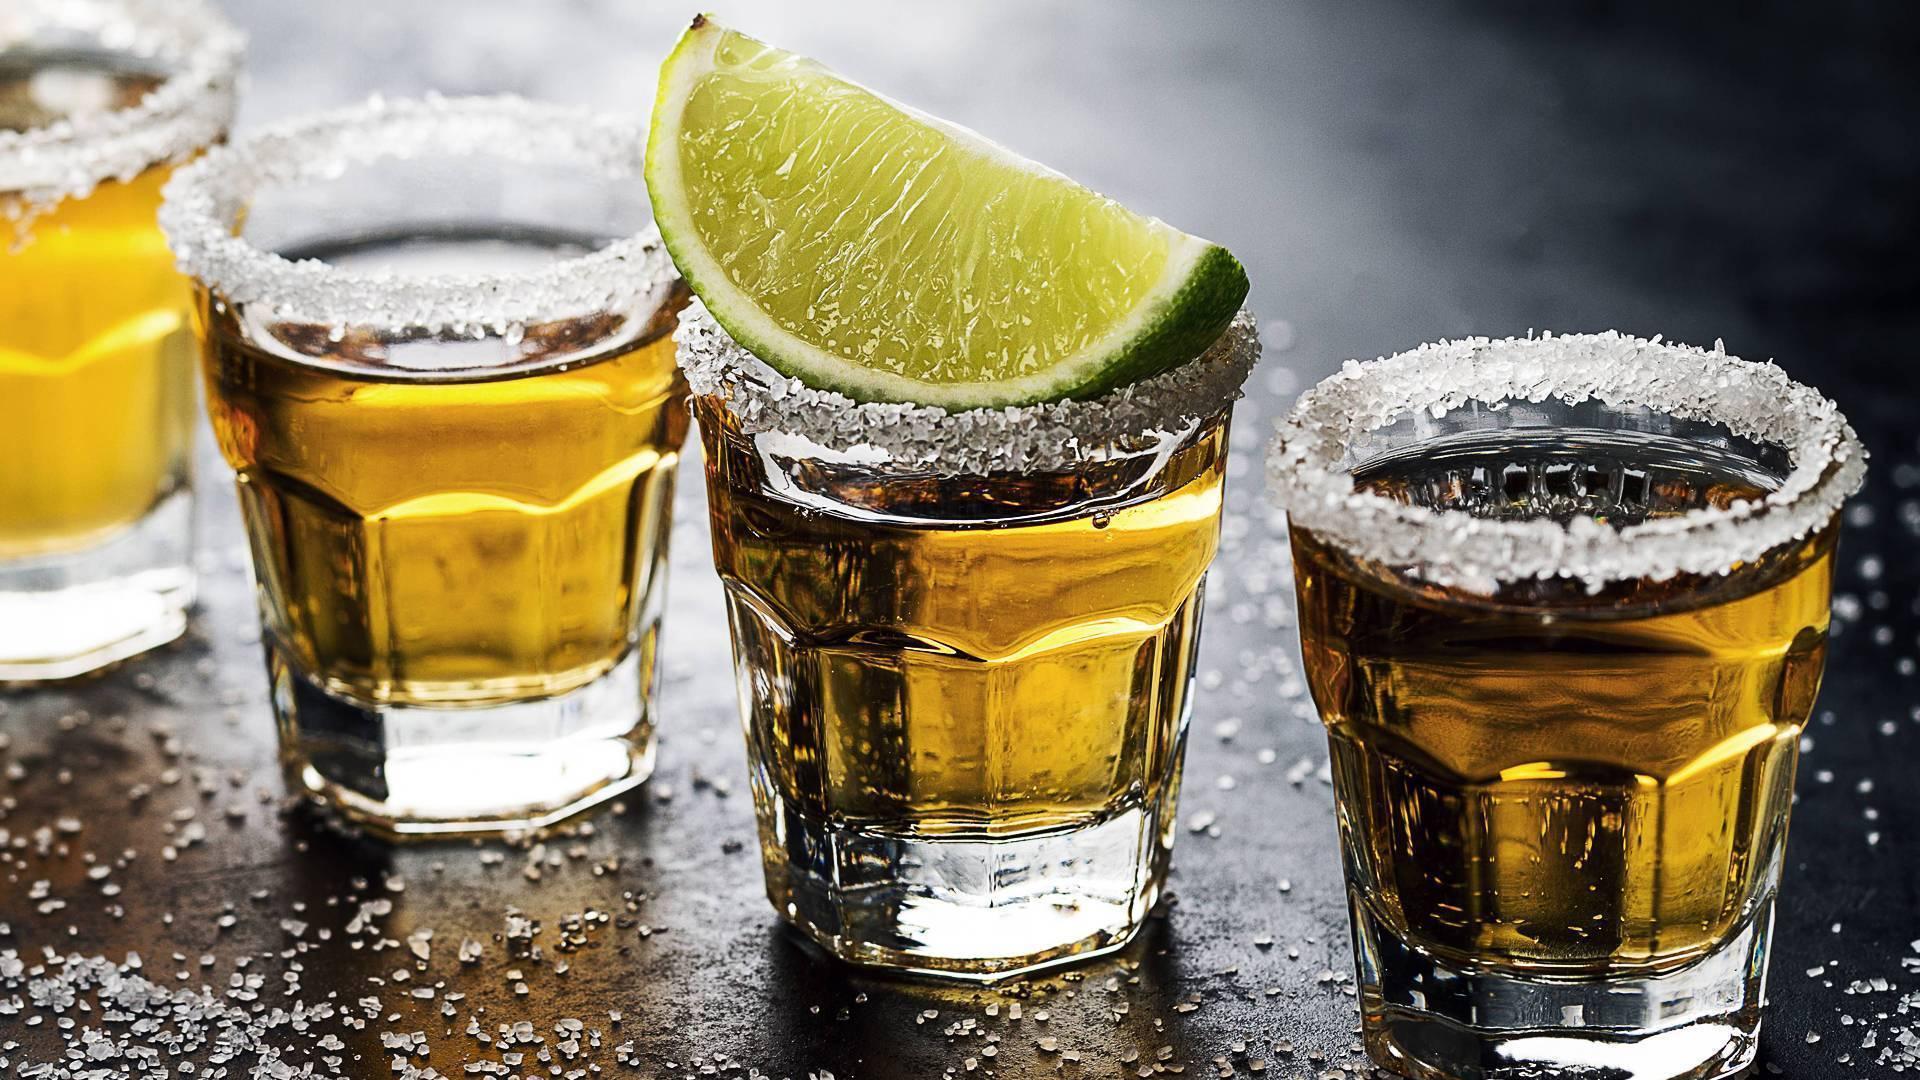 Мексиканский напиток. сколько градусов в текиле?